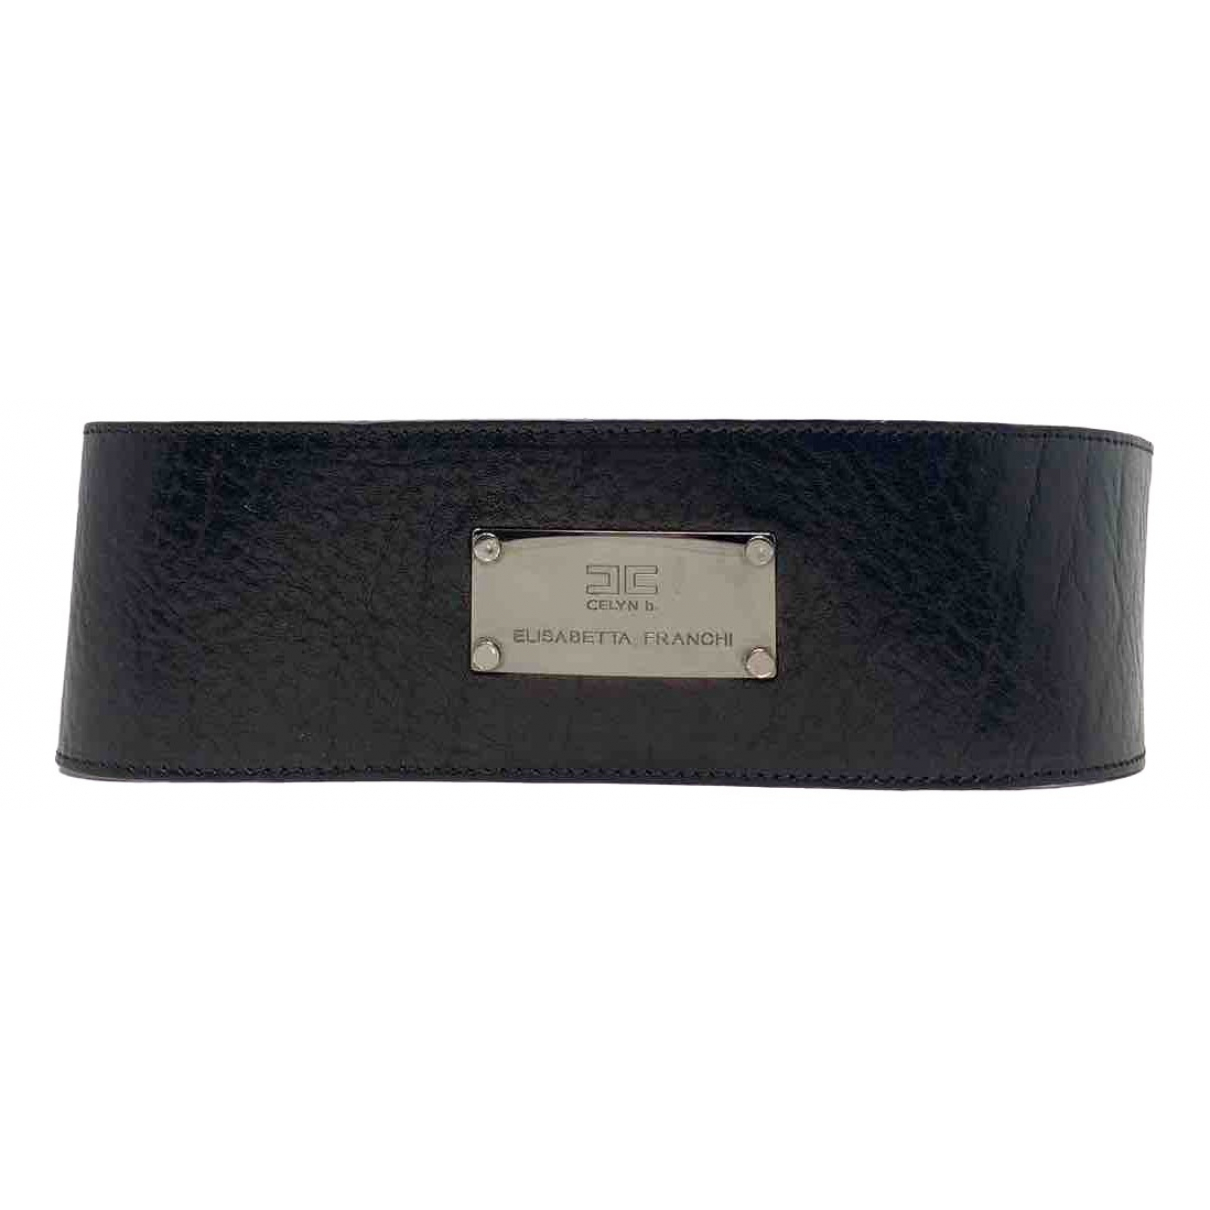 Elisabetta Franchi \N Black Leather belt for Women M International